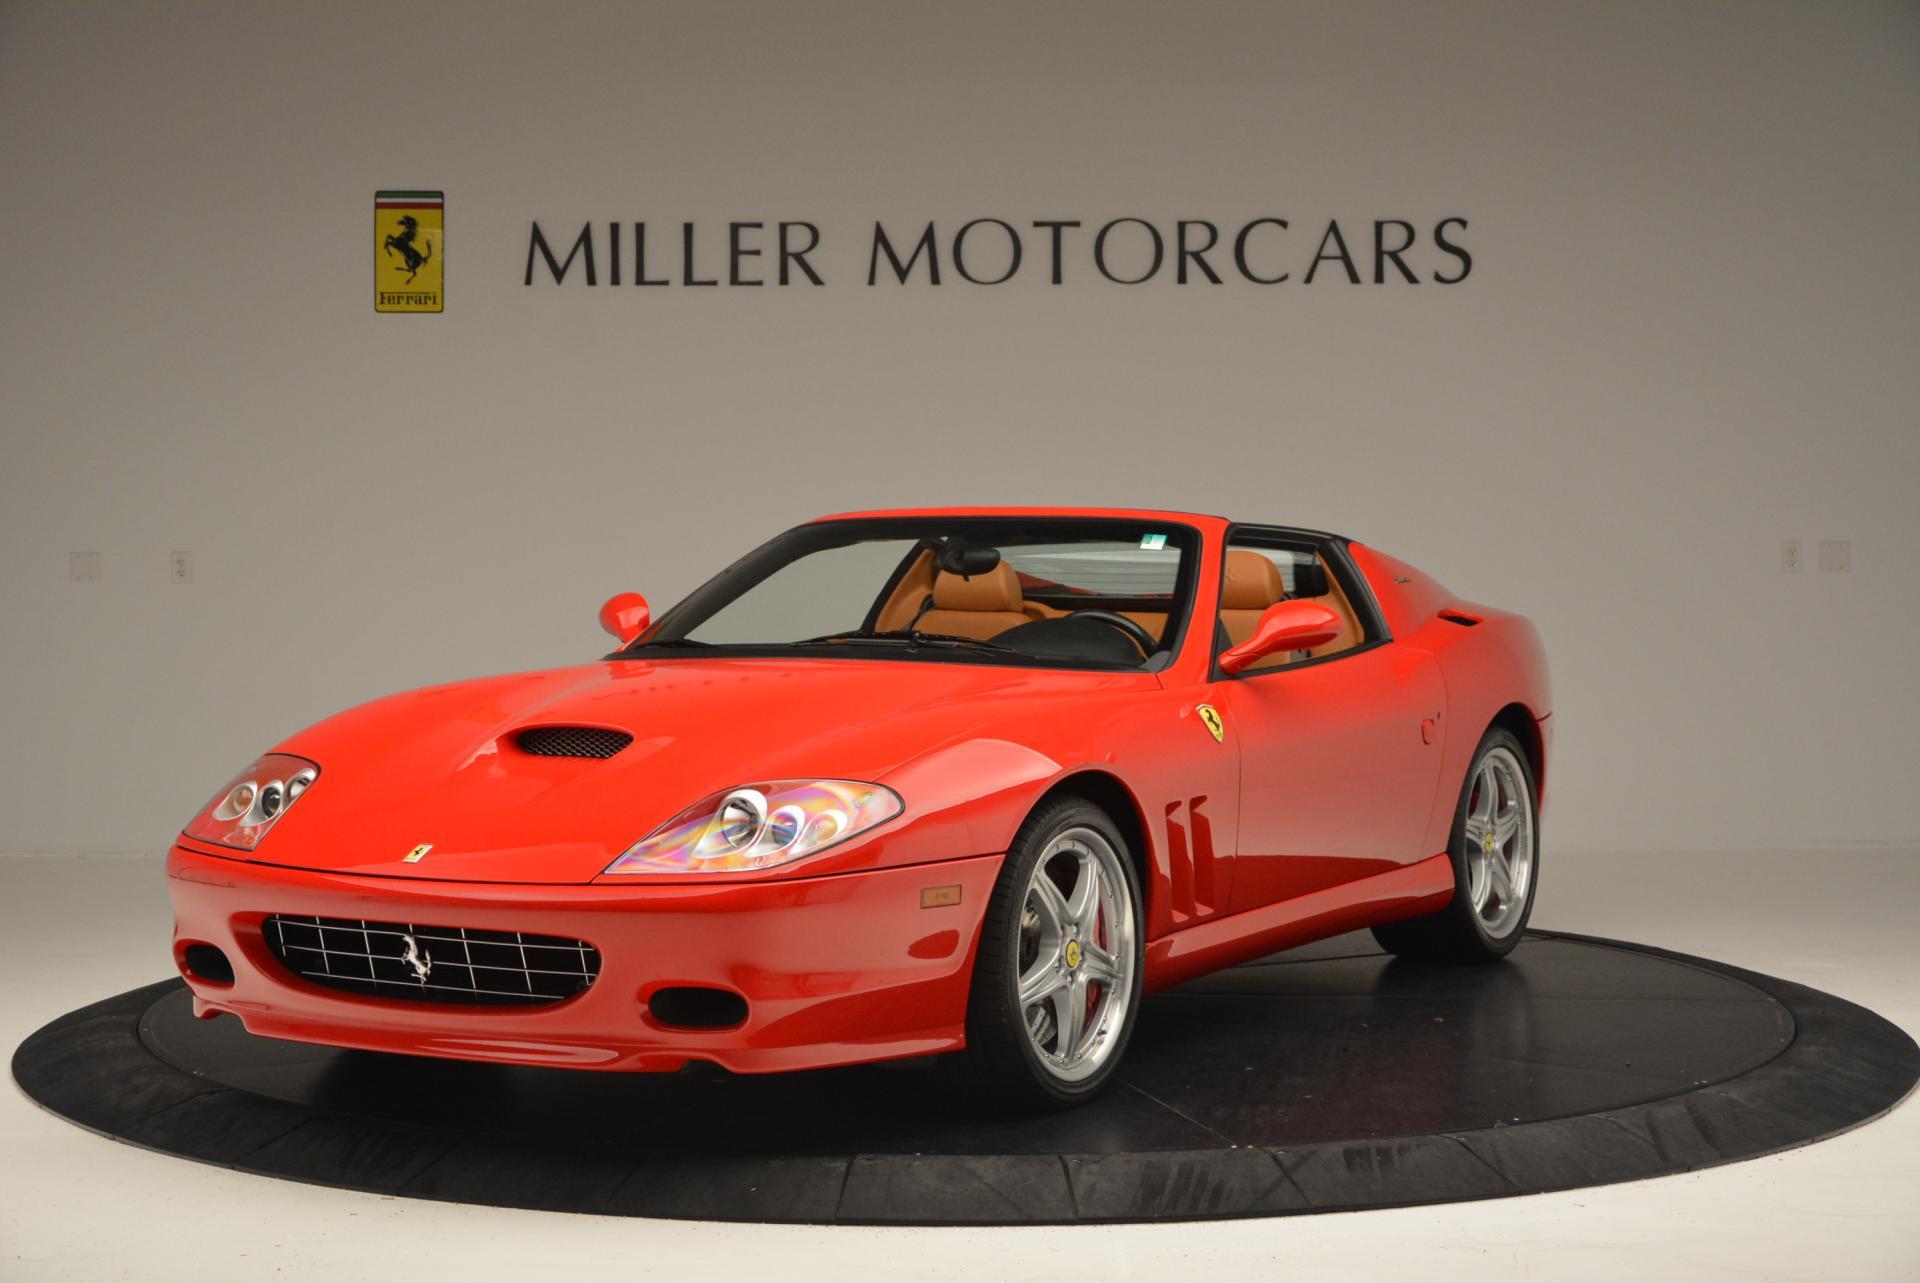 Used 2005 Ferrari Superamerica for sale Sold at Maserati of Westport in Westport CT 06880 1